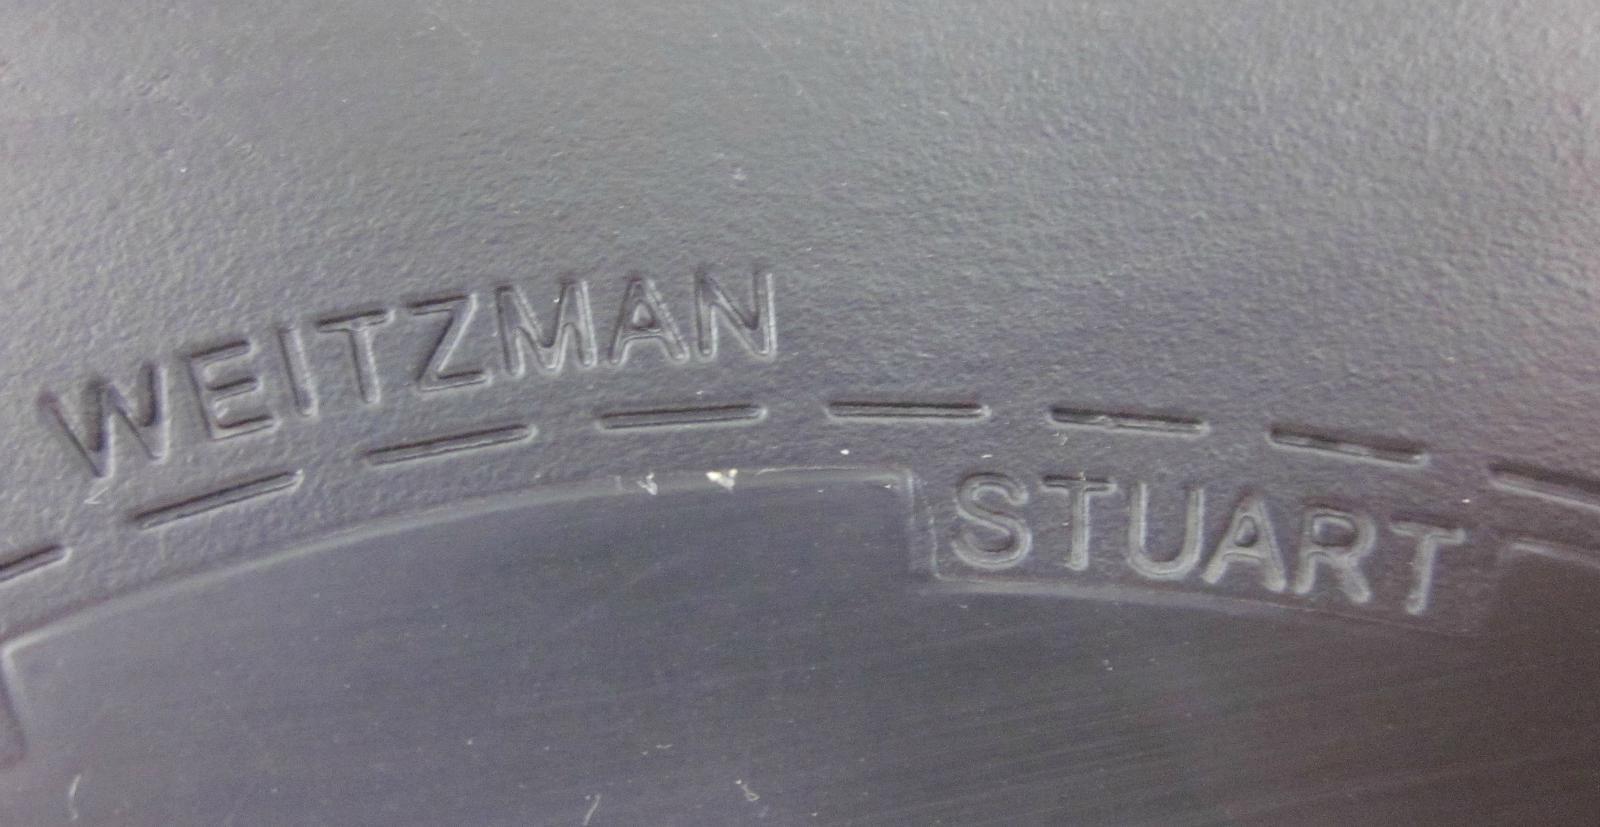 Stuart Weitzman Tortoiseshell Round Toe Wedge Pumps Tortoiseshell Weitzman Patent Leather US 6M 6dccfa